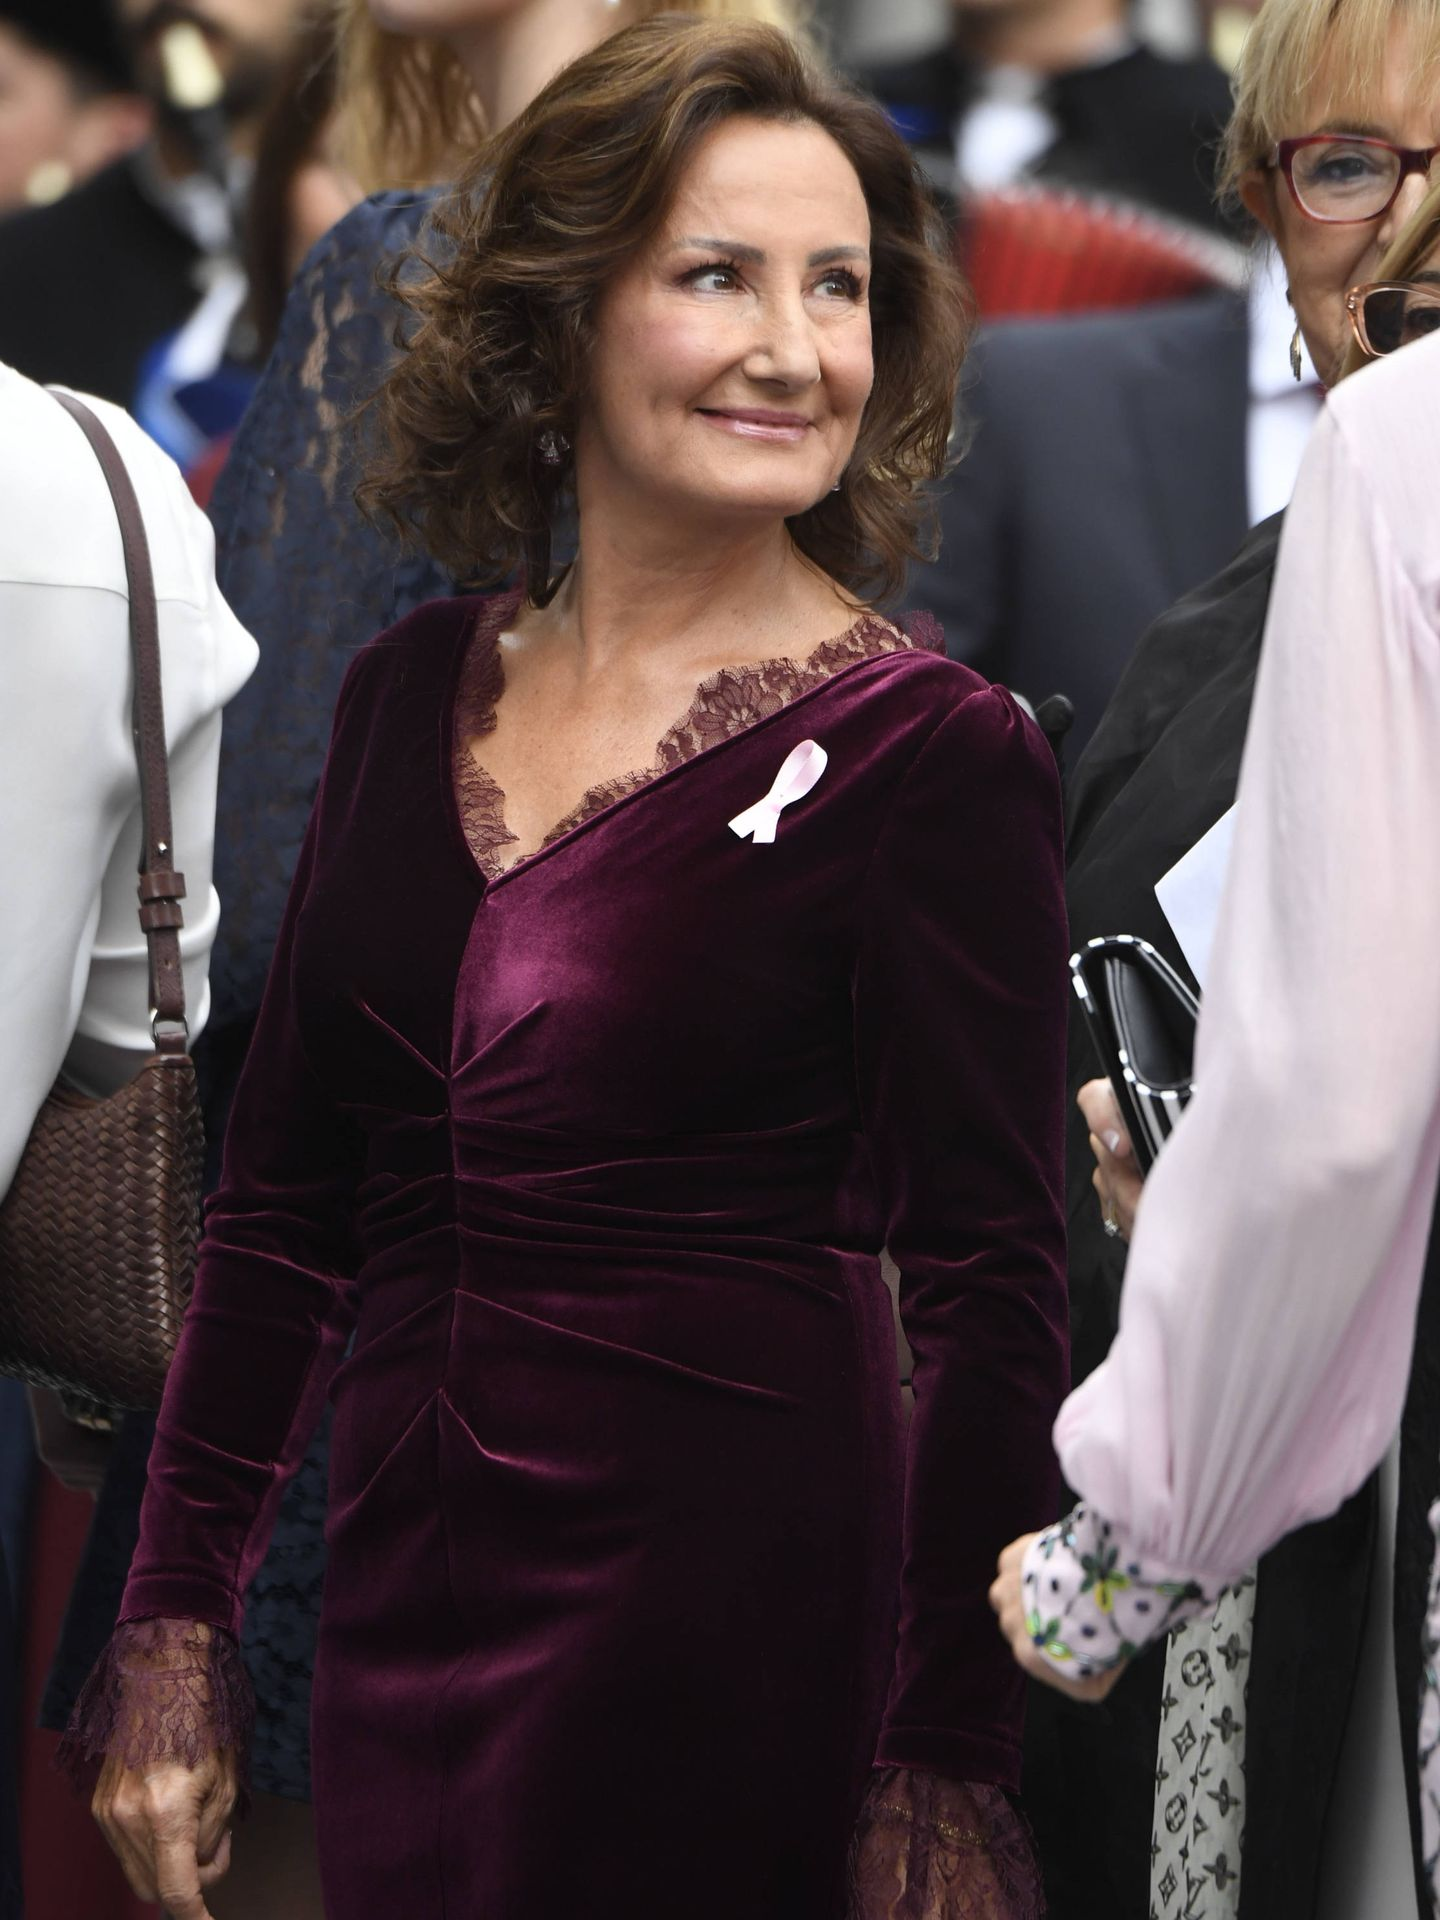 Paloma Rocasolano, a su llegada al teatro Campoamor. (Limited Pictures)